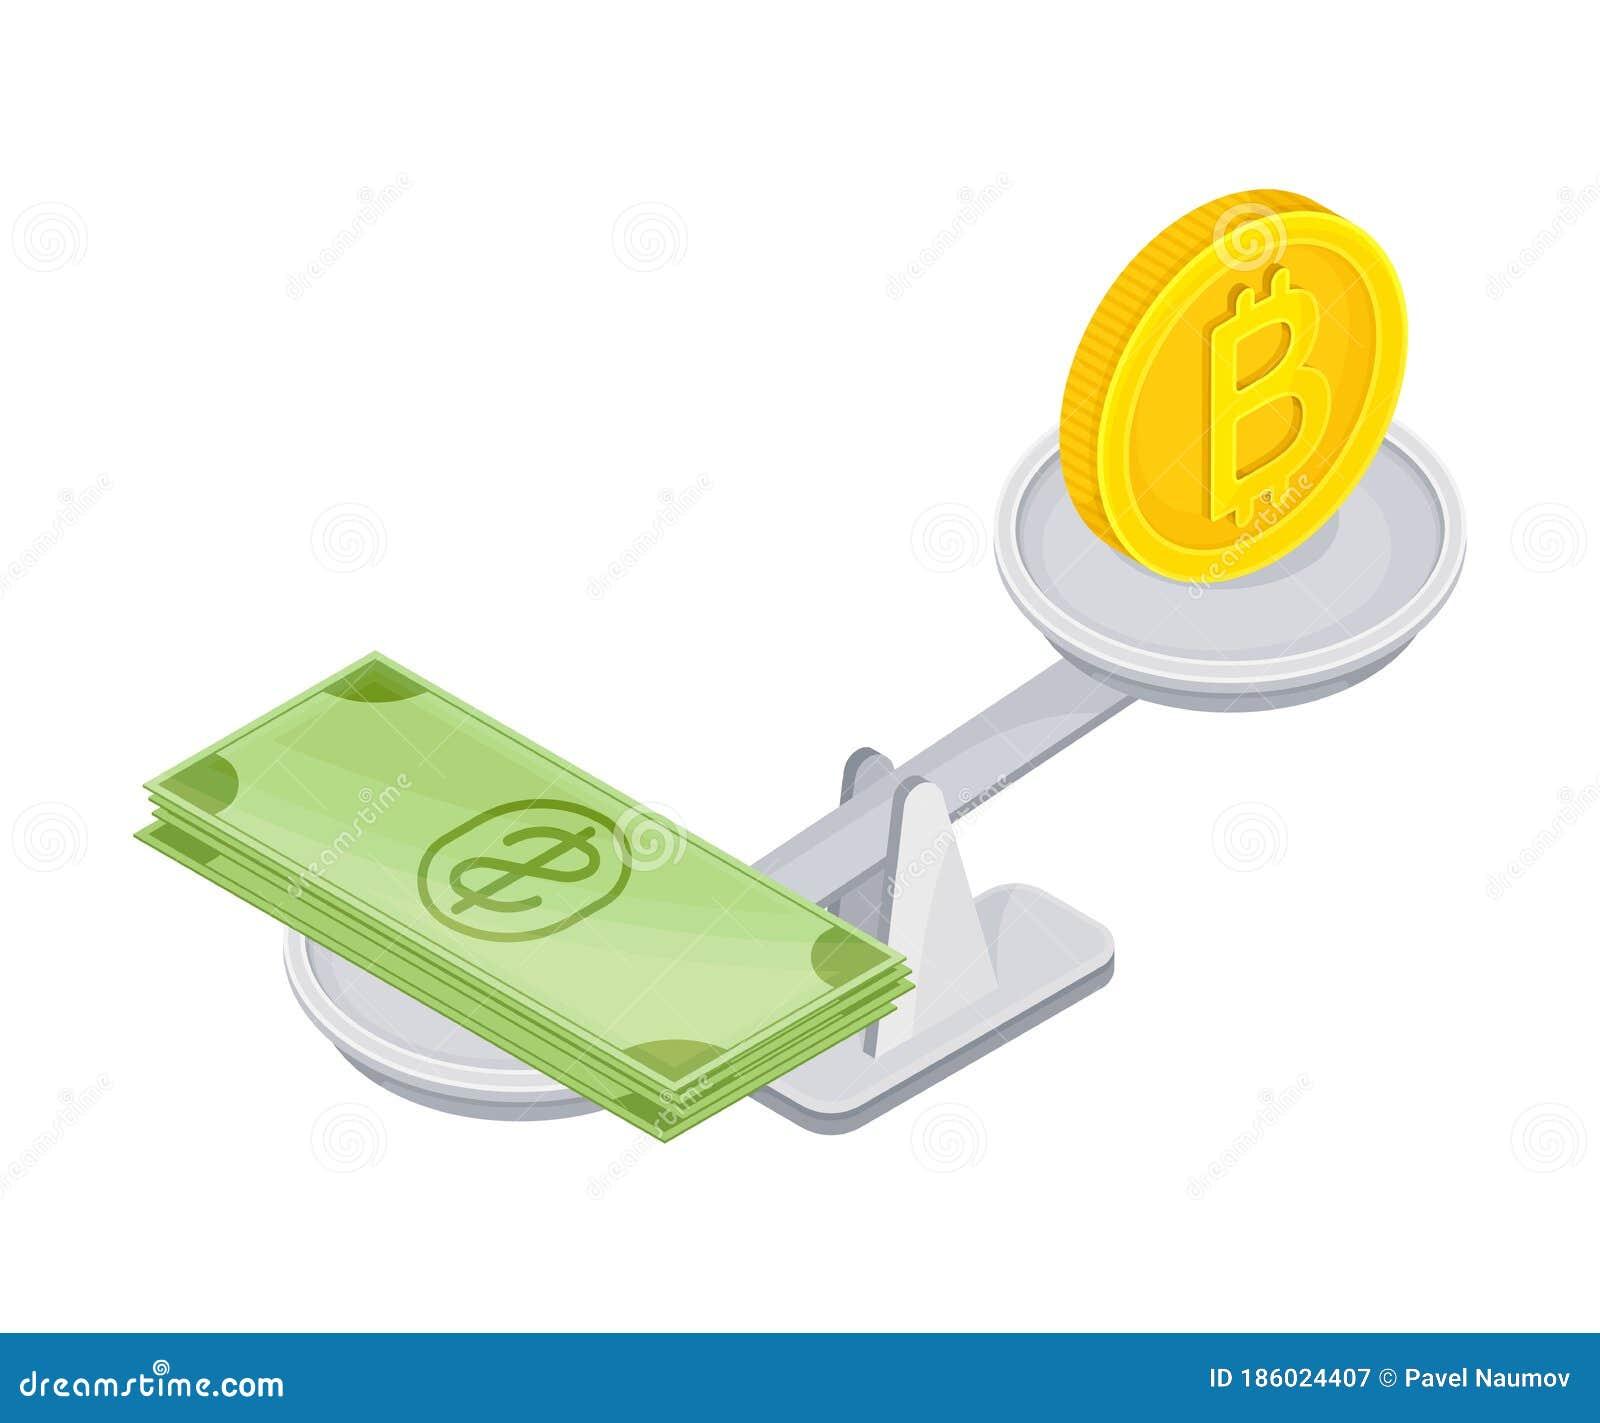 Bitcoin bit, First Bitcoin Į Somoni gyventi diagramoje ne 10 Balandis 2020